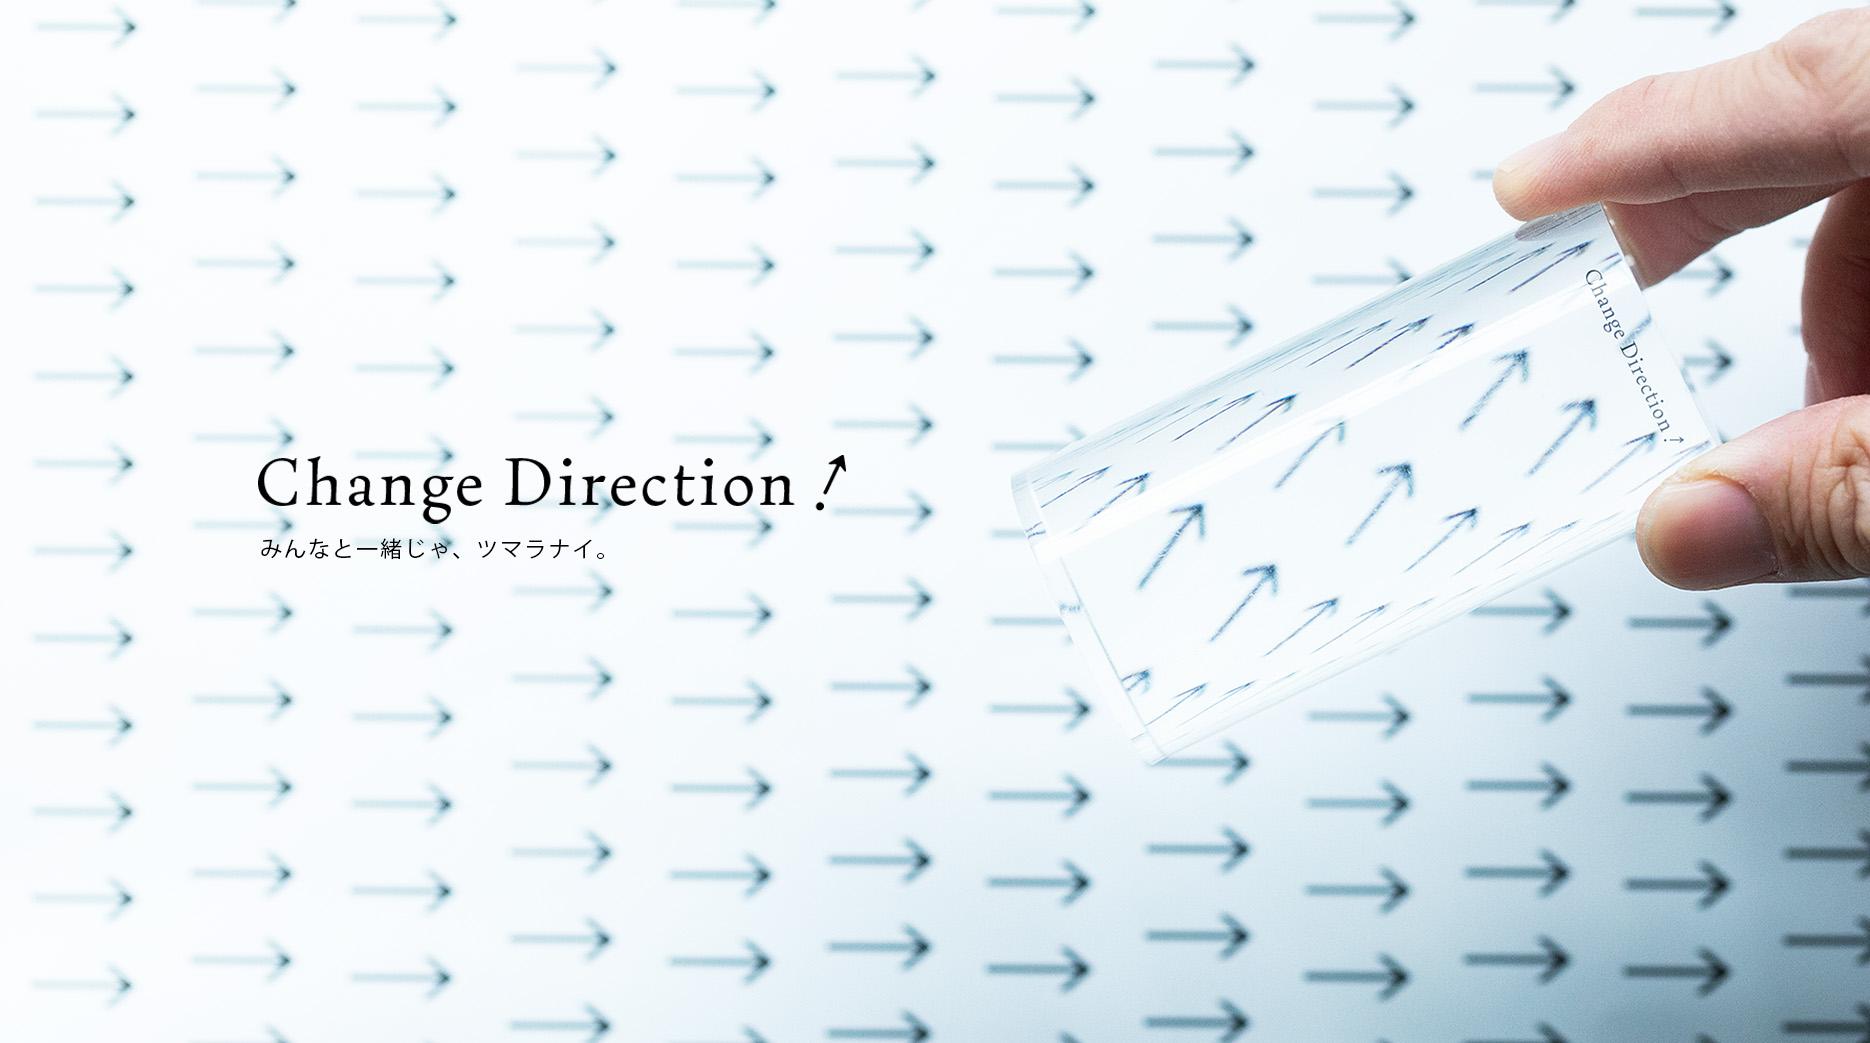 Change Direction!